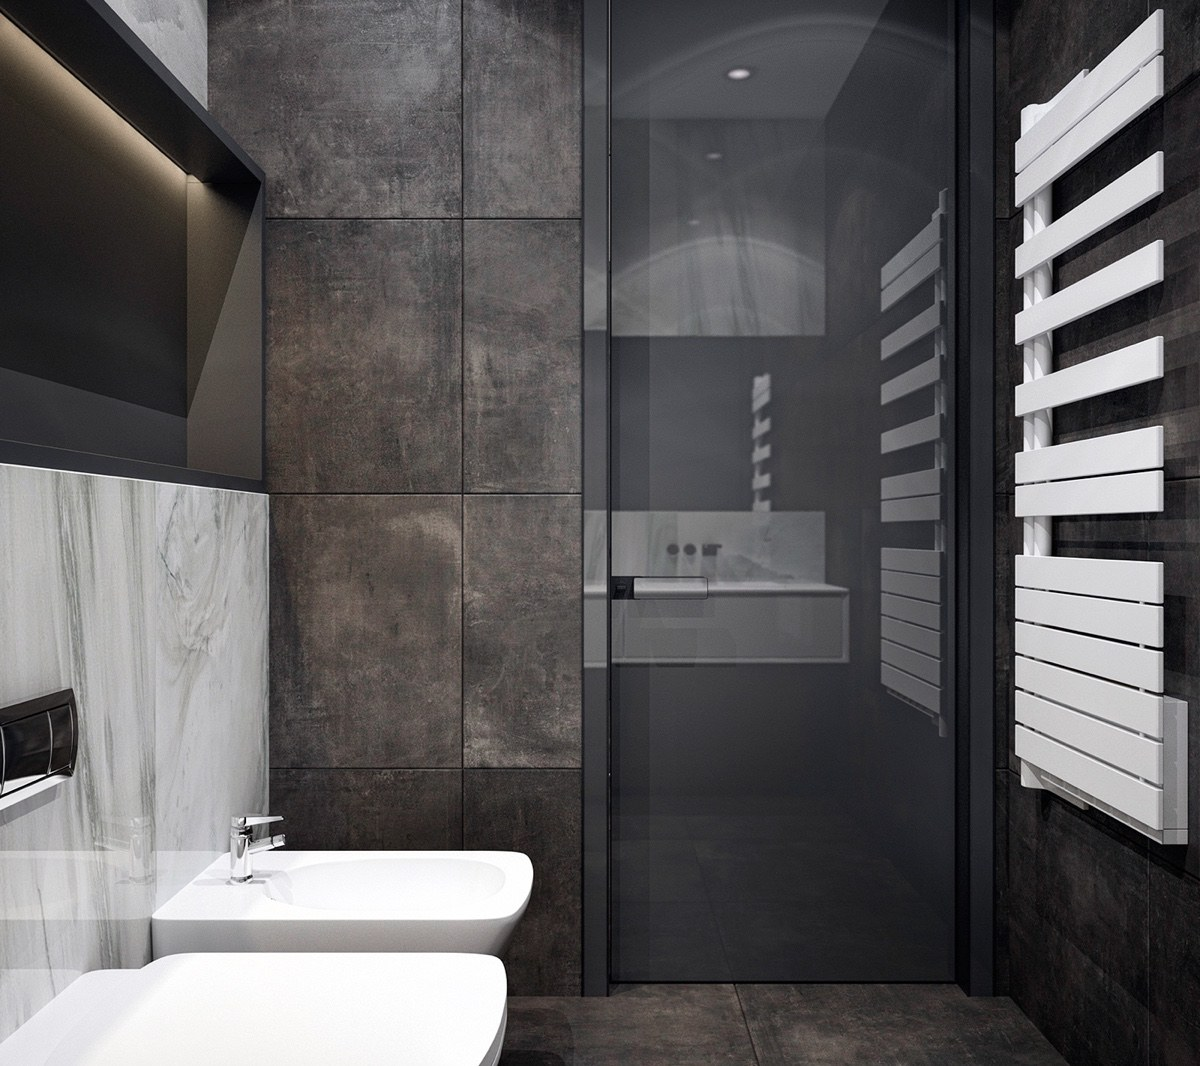 30 Black White Living Rooms That Work Their Monochrome Magic: 4 Monochrome, Minimalist Spaces Creating Black And White Magic